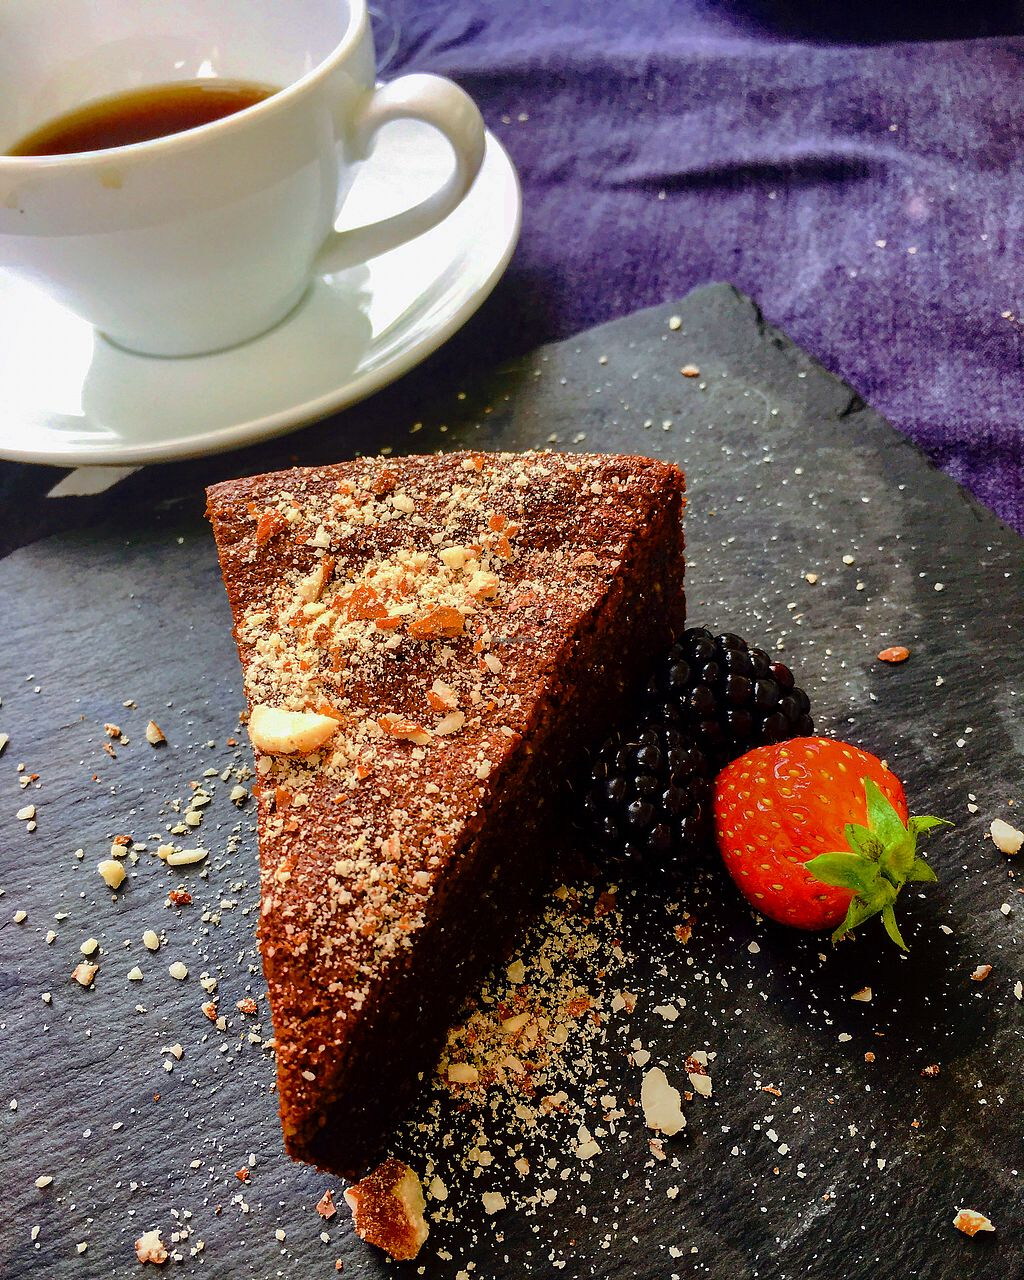 "Photo of Salad Me Cafe  by <a href=""/members/profile/ElkeBa"">ElkeBa</a> <br/>schoko Kakao Torte <br/> July 21, 2017  - <a href='/contact/abuse/image/55193/282867'>Report</a>"